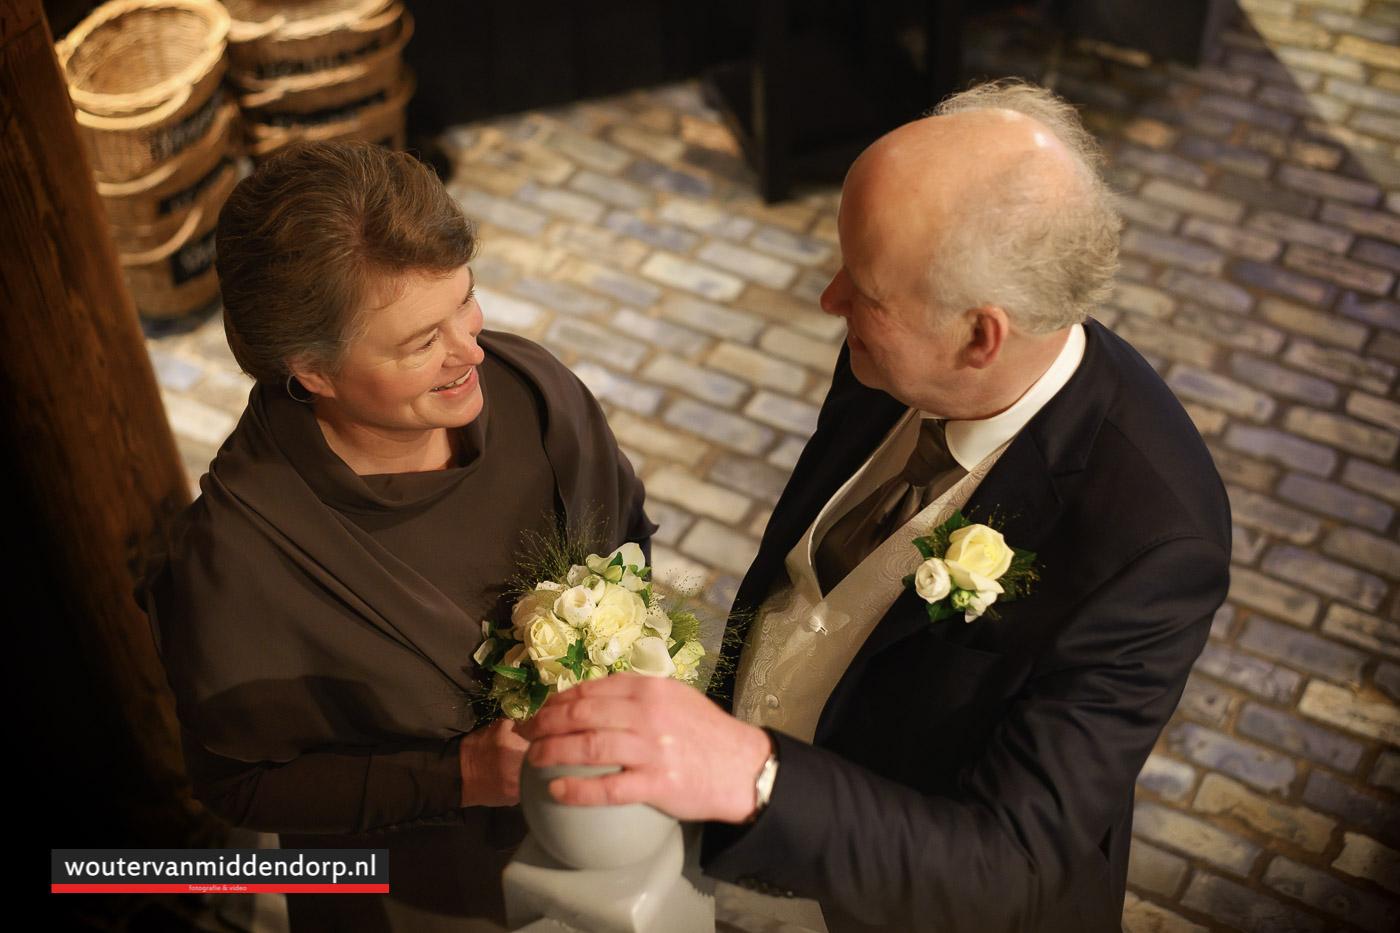 bruidsfotografie Wouter van Middendorp Uddel Elspeet Barneveld, omgeving trouwfotograaf-18